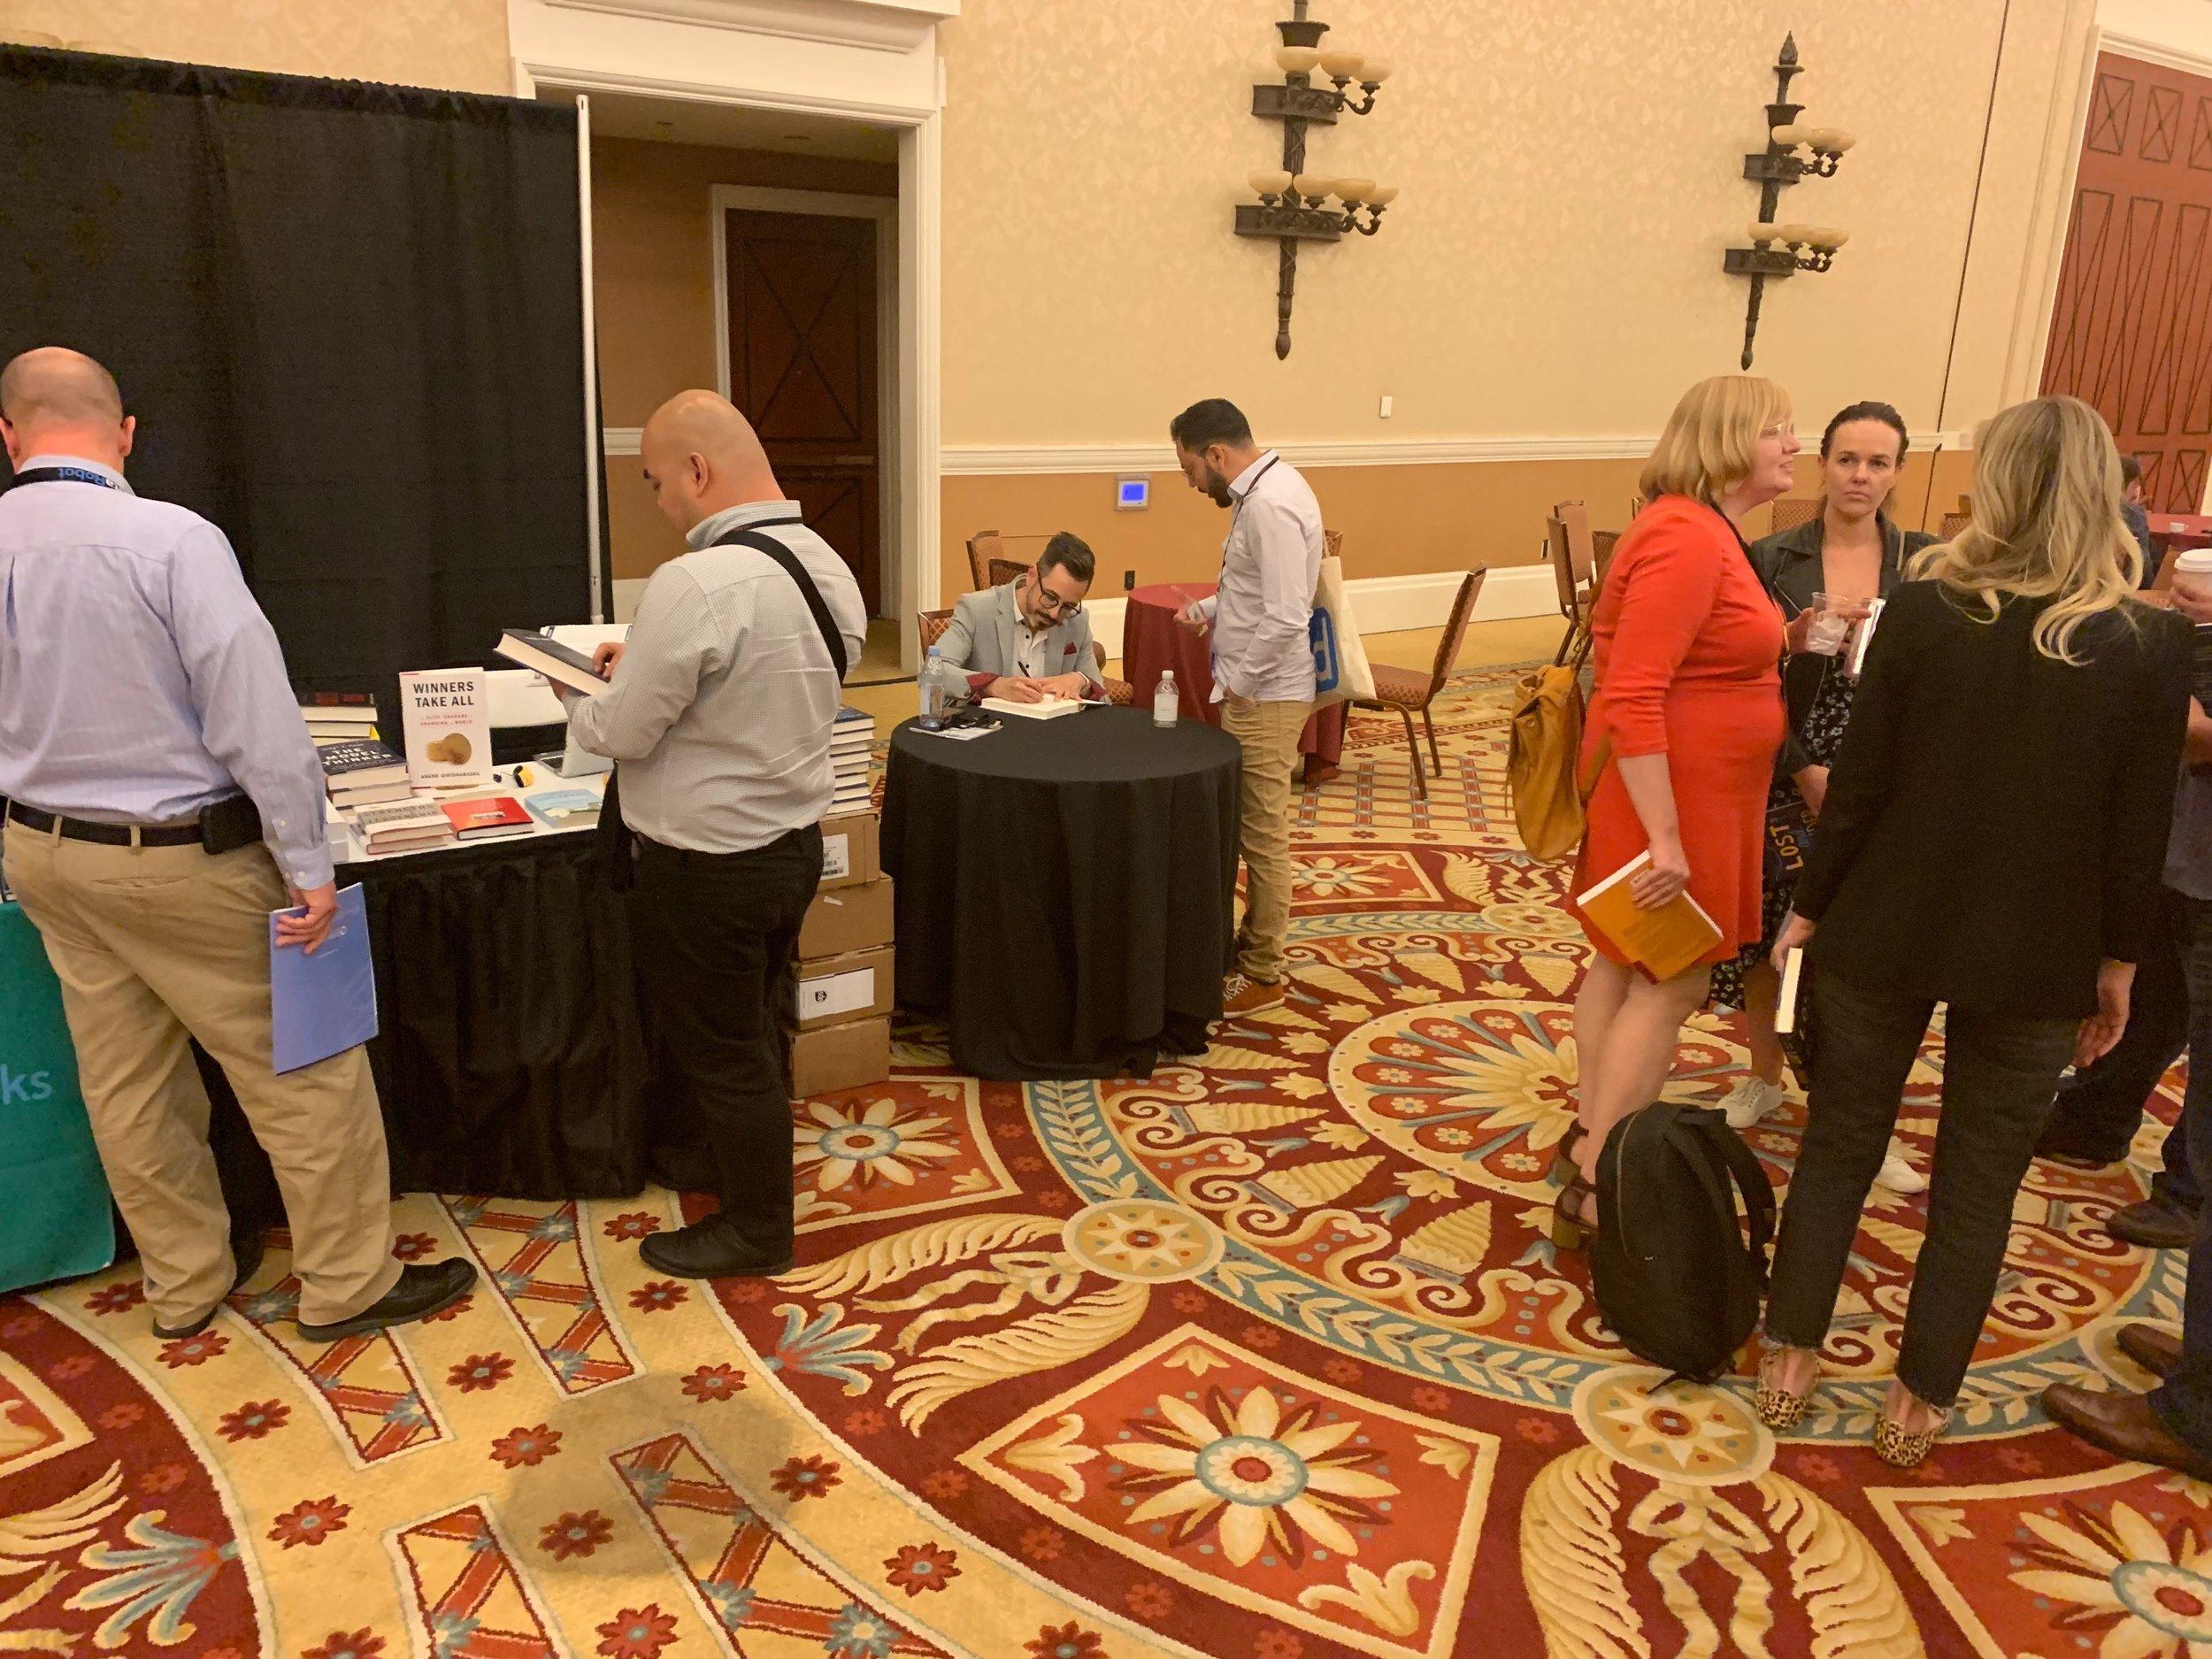 Mega Paw Predictive World Analytitc Conference 2019 Las Vegas